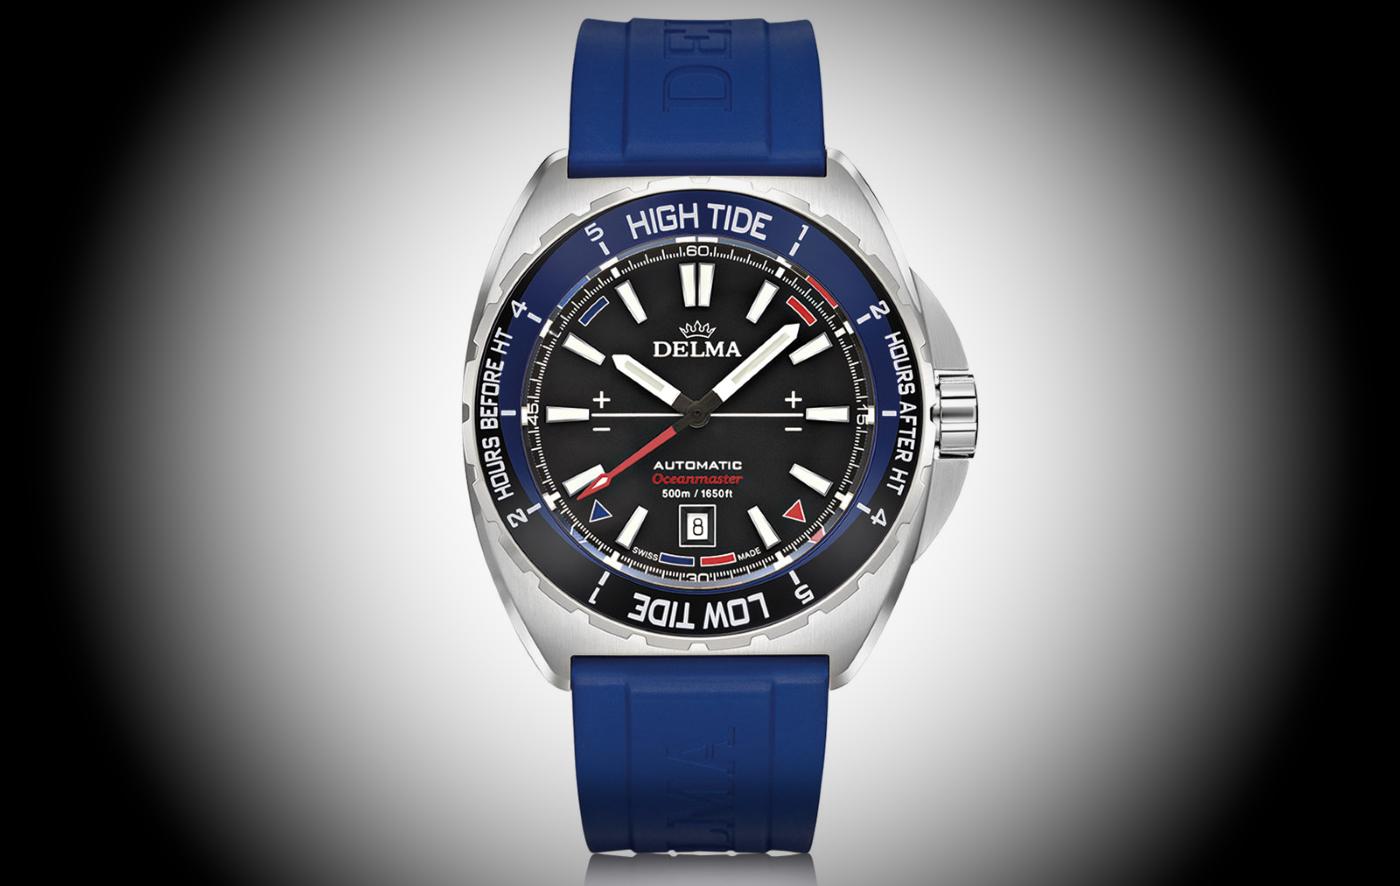 Original: Delma's tidal tracking timepiece